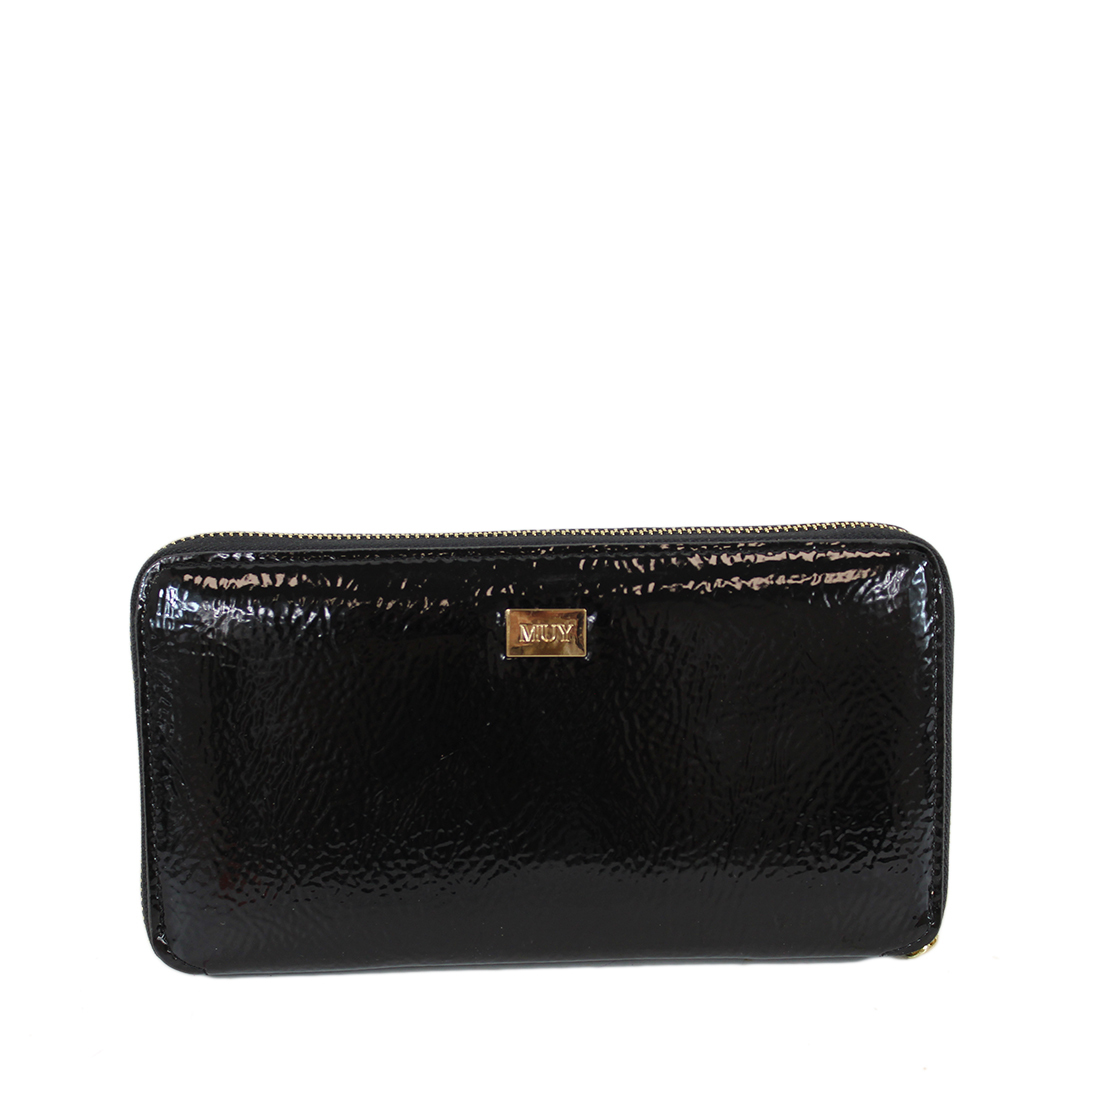 Large shiny zip wallet